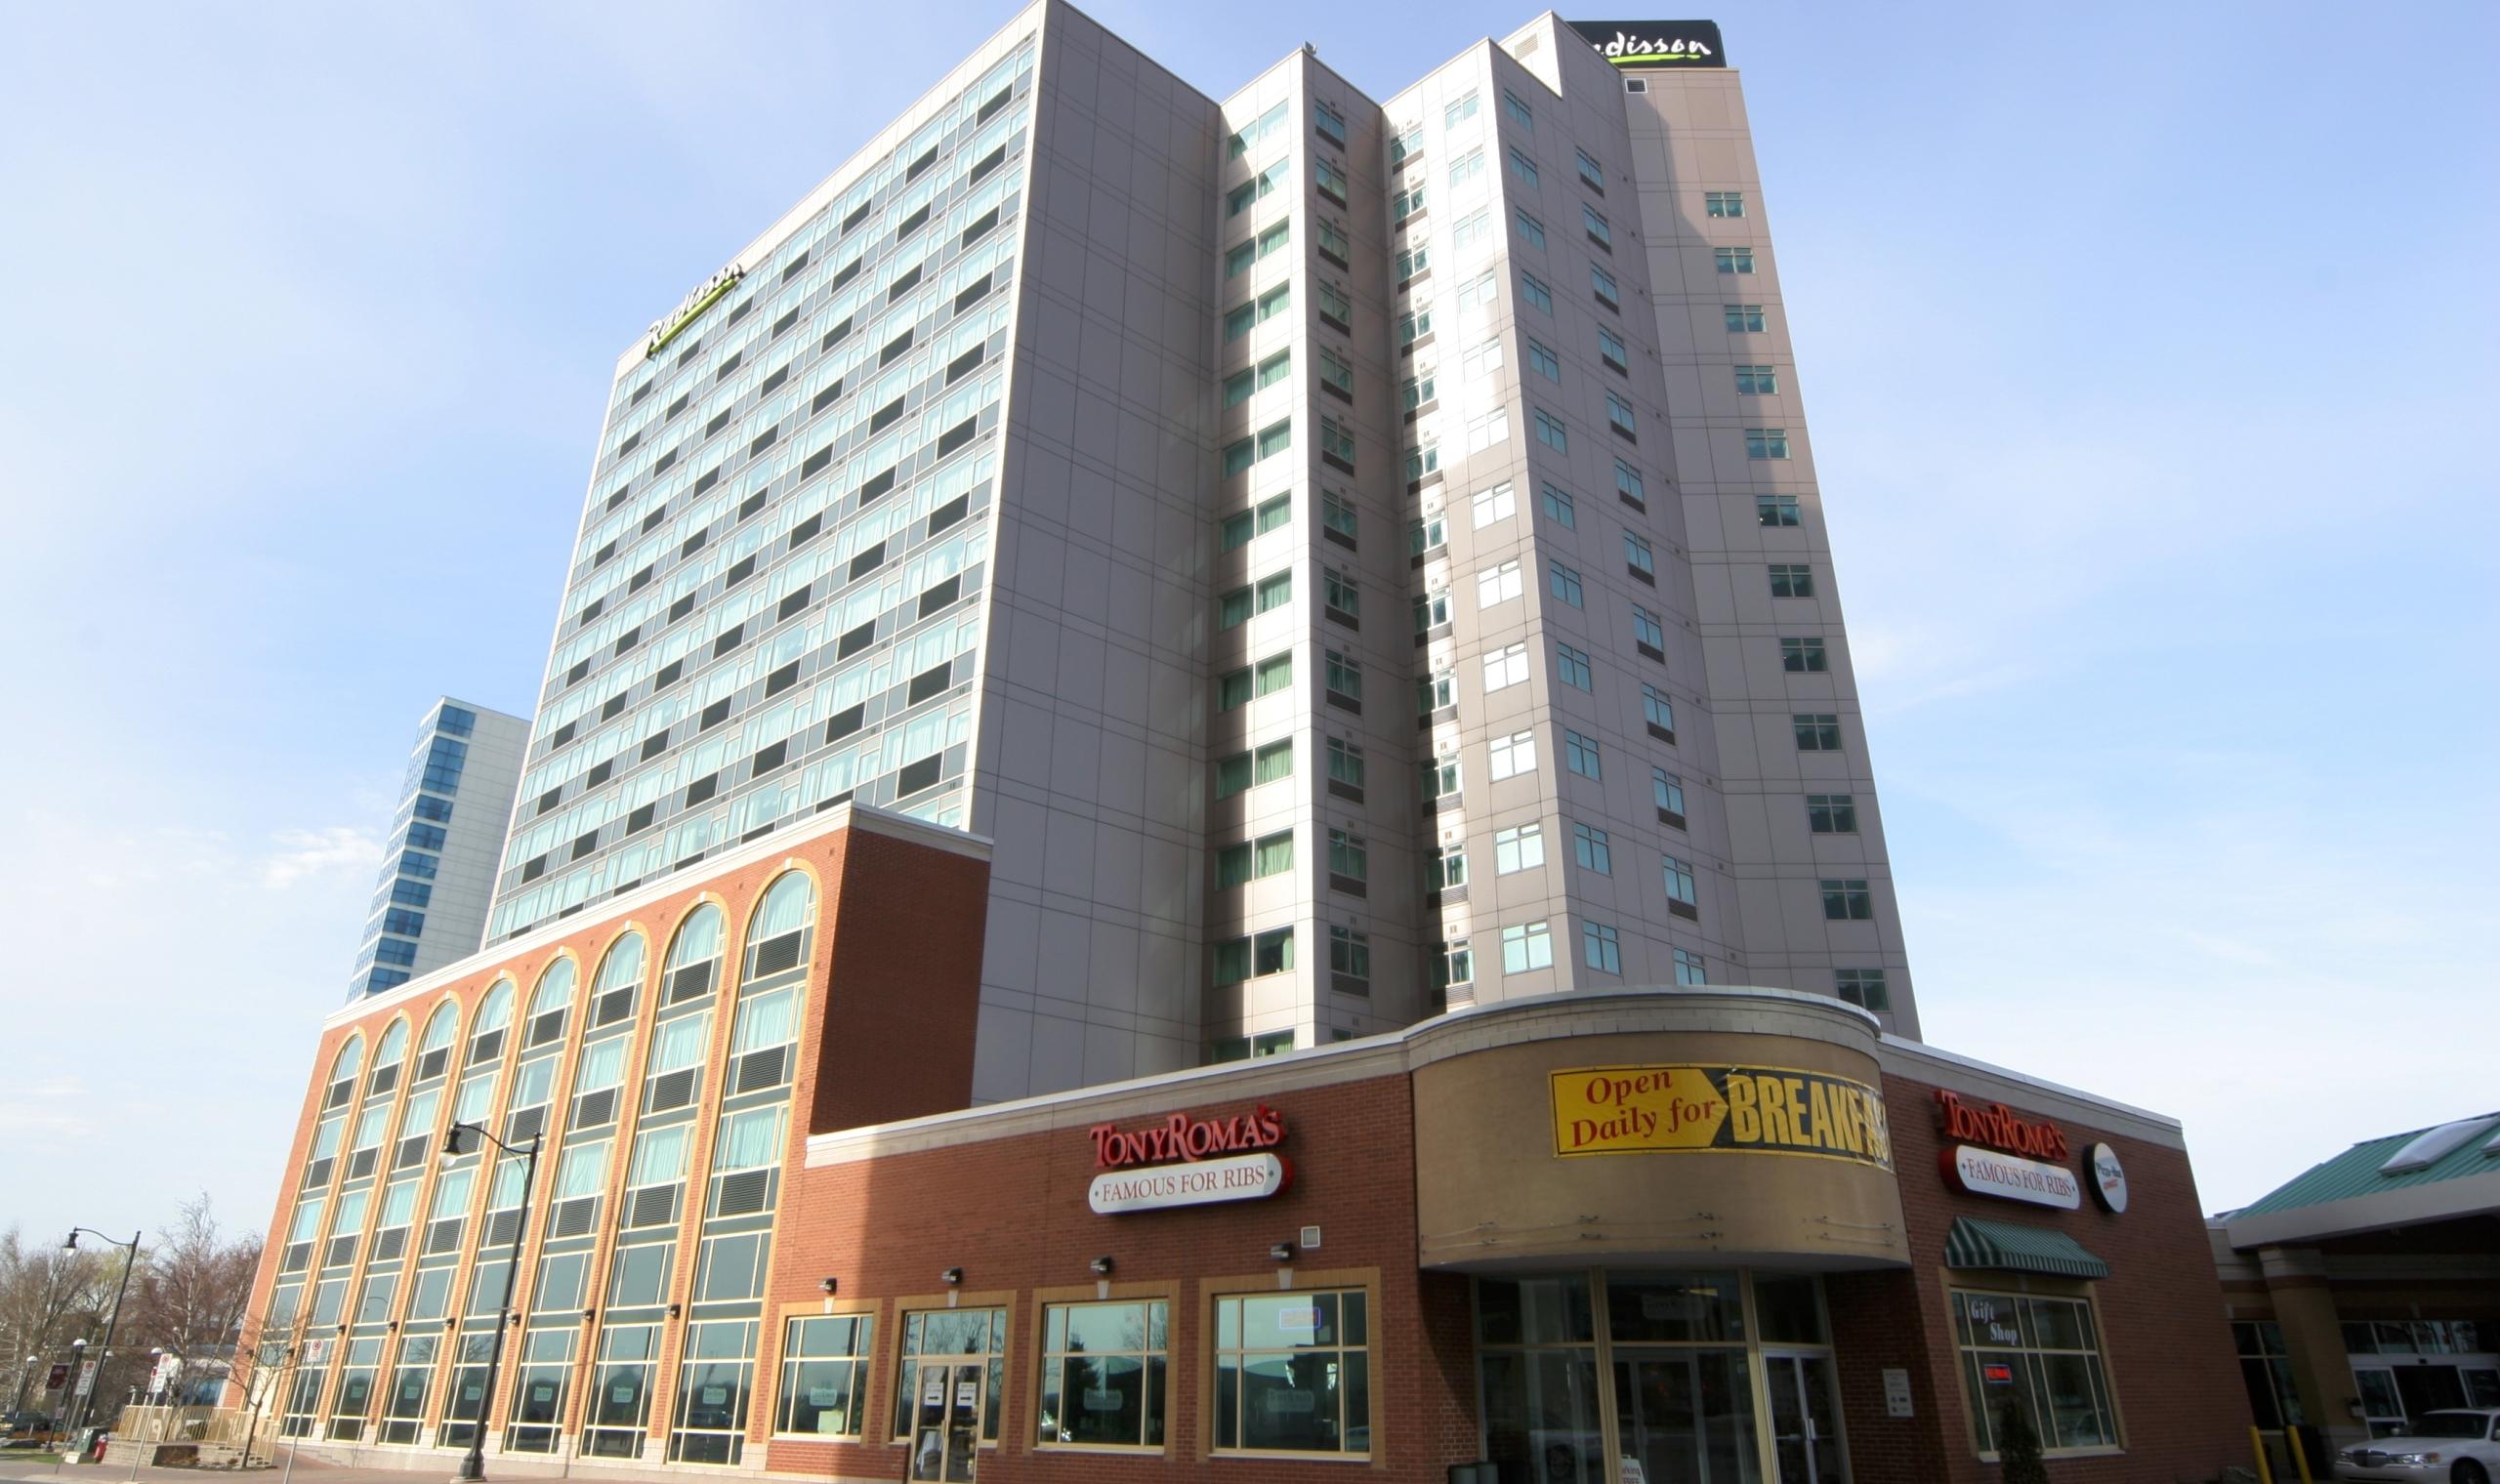 Radisson hotel suites fallsview niagara falls for Radisson hotel